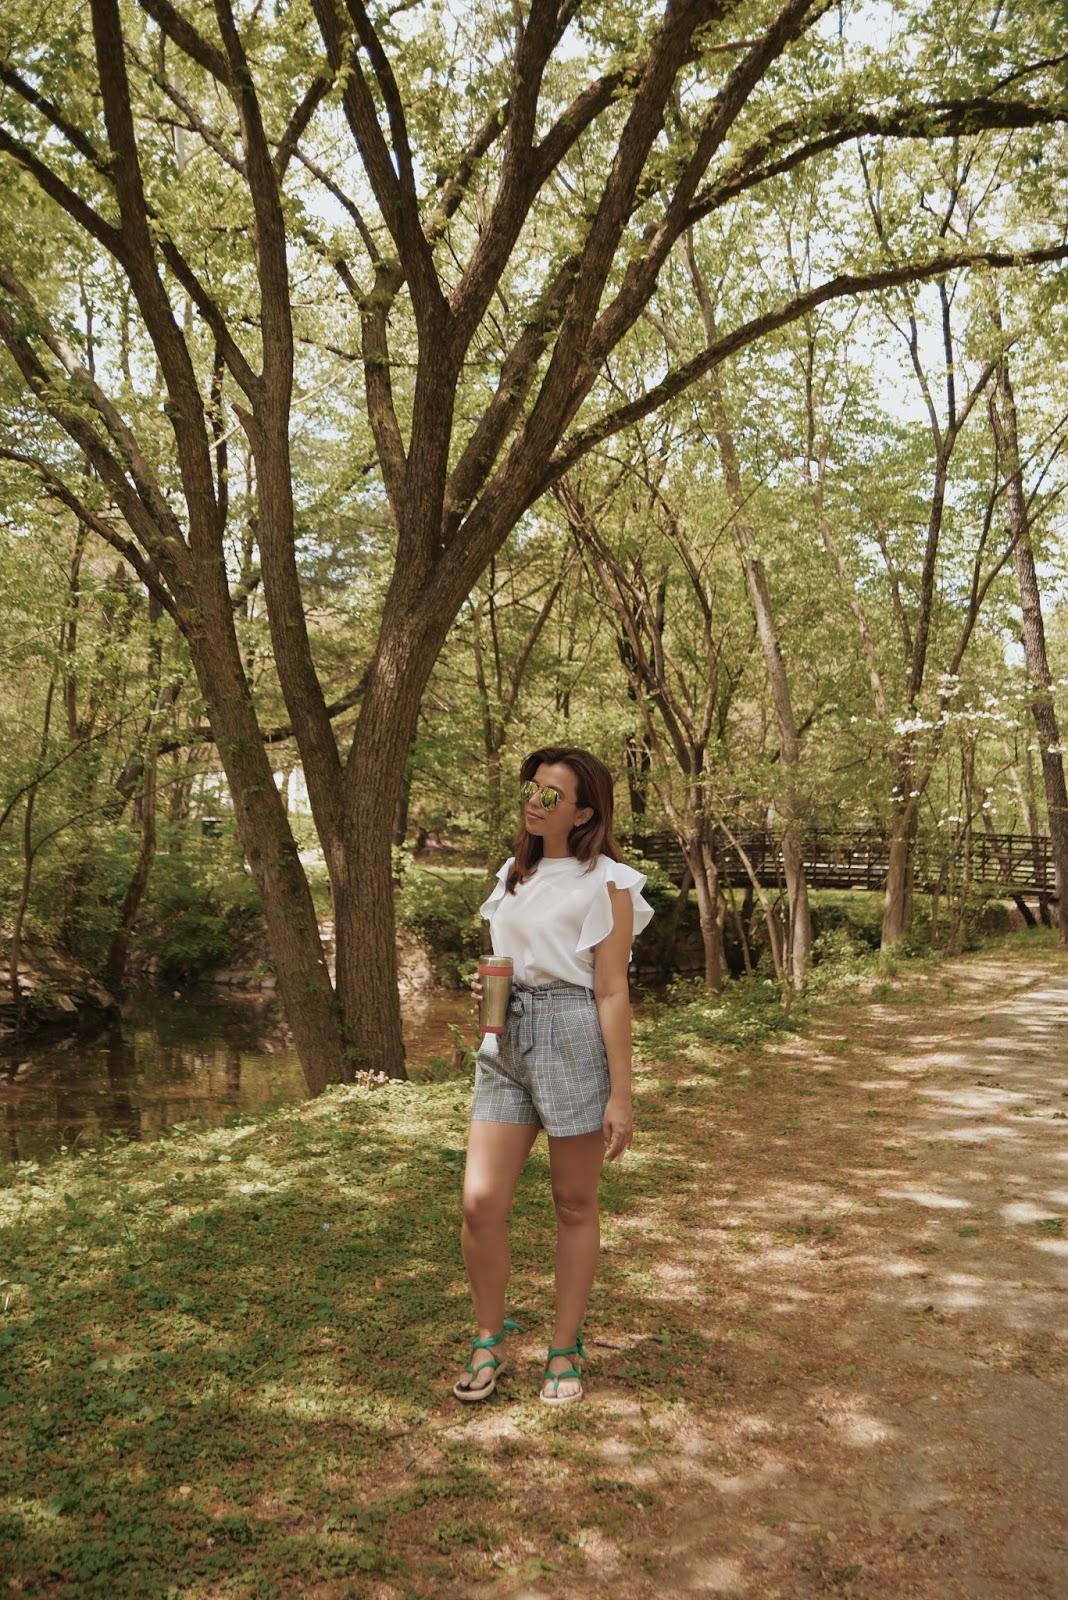 Sunday Vibes by Mari Estilo Wearing:  Tshirt: LightInTheBox   Shorts: SheIn   Sandals: Nalho